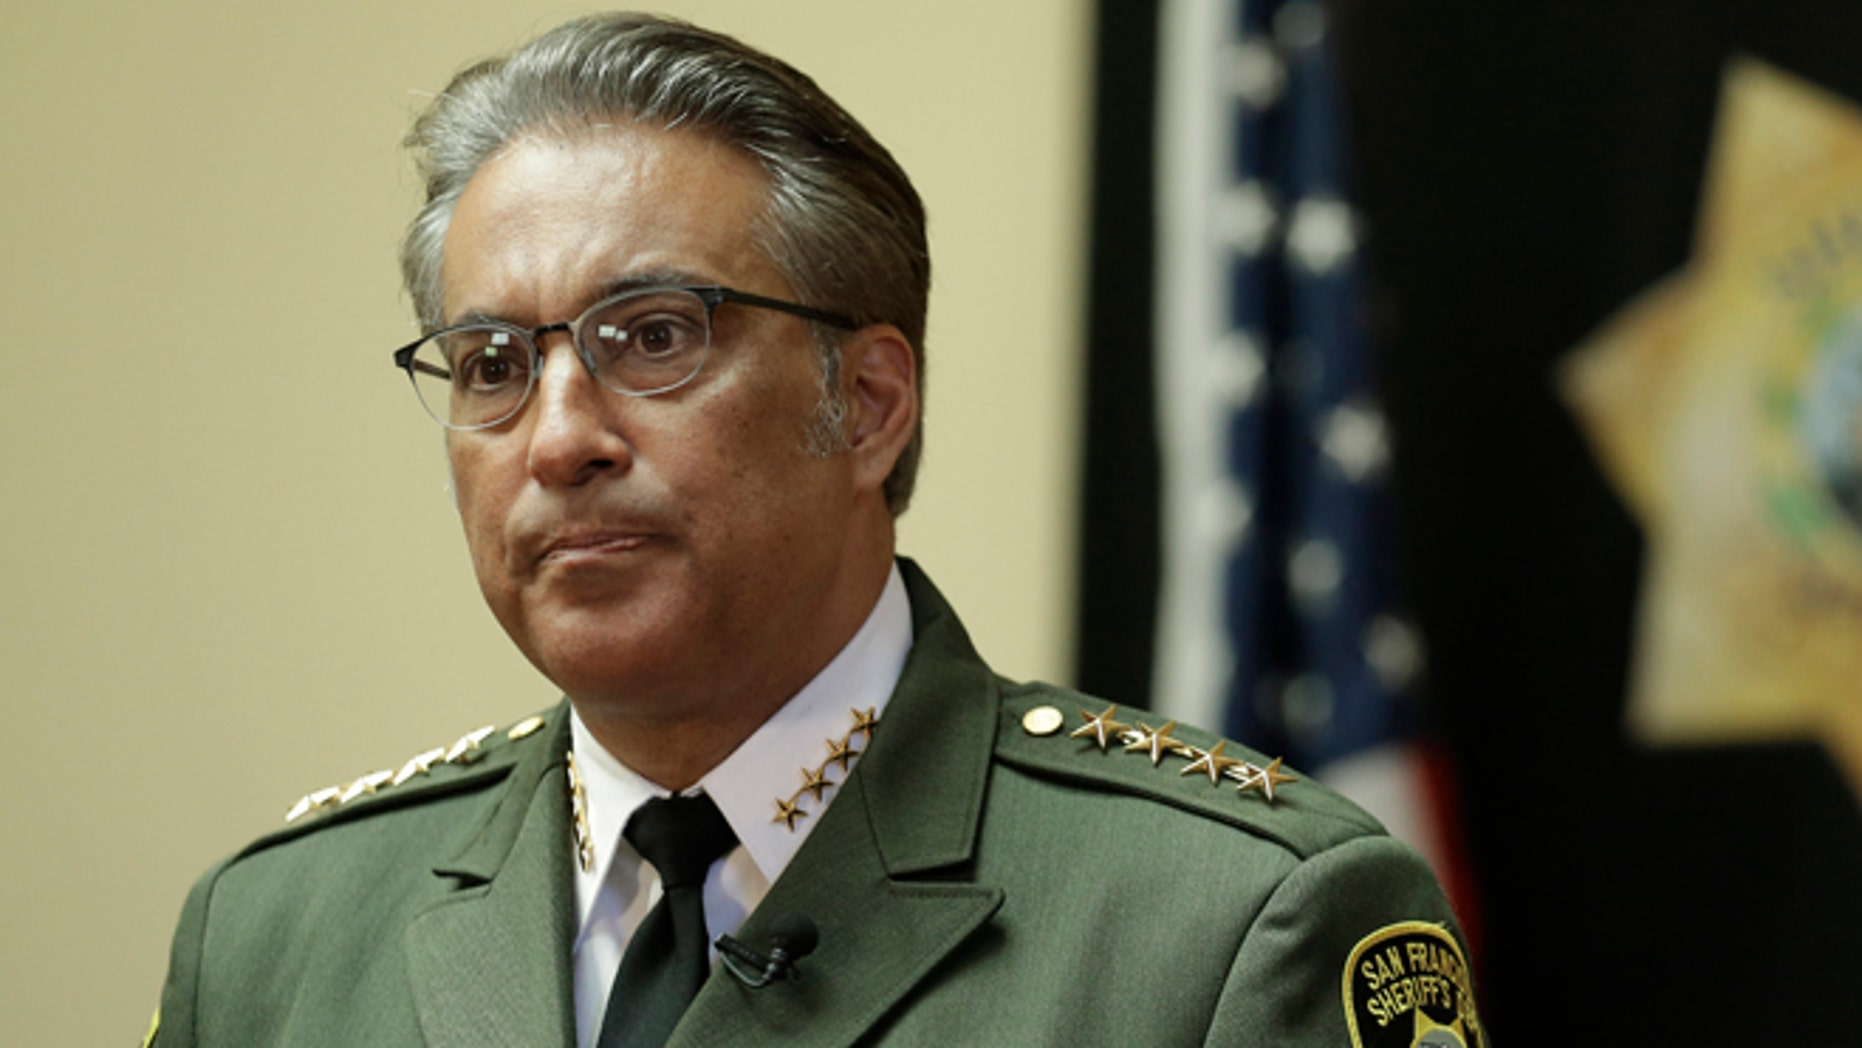 San Francisco Sheriff Ross Mirkarimi fields questions on Monday, July 6, 2015.